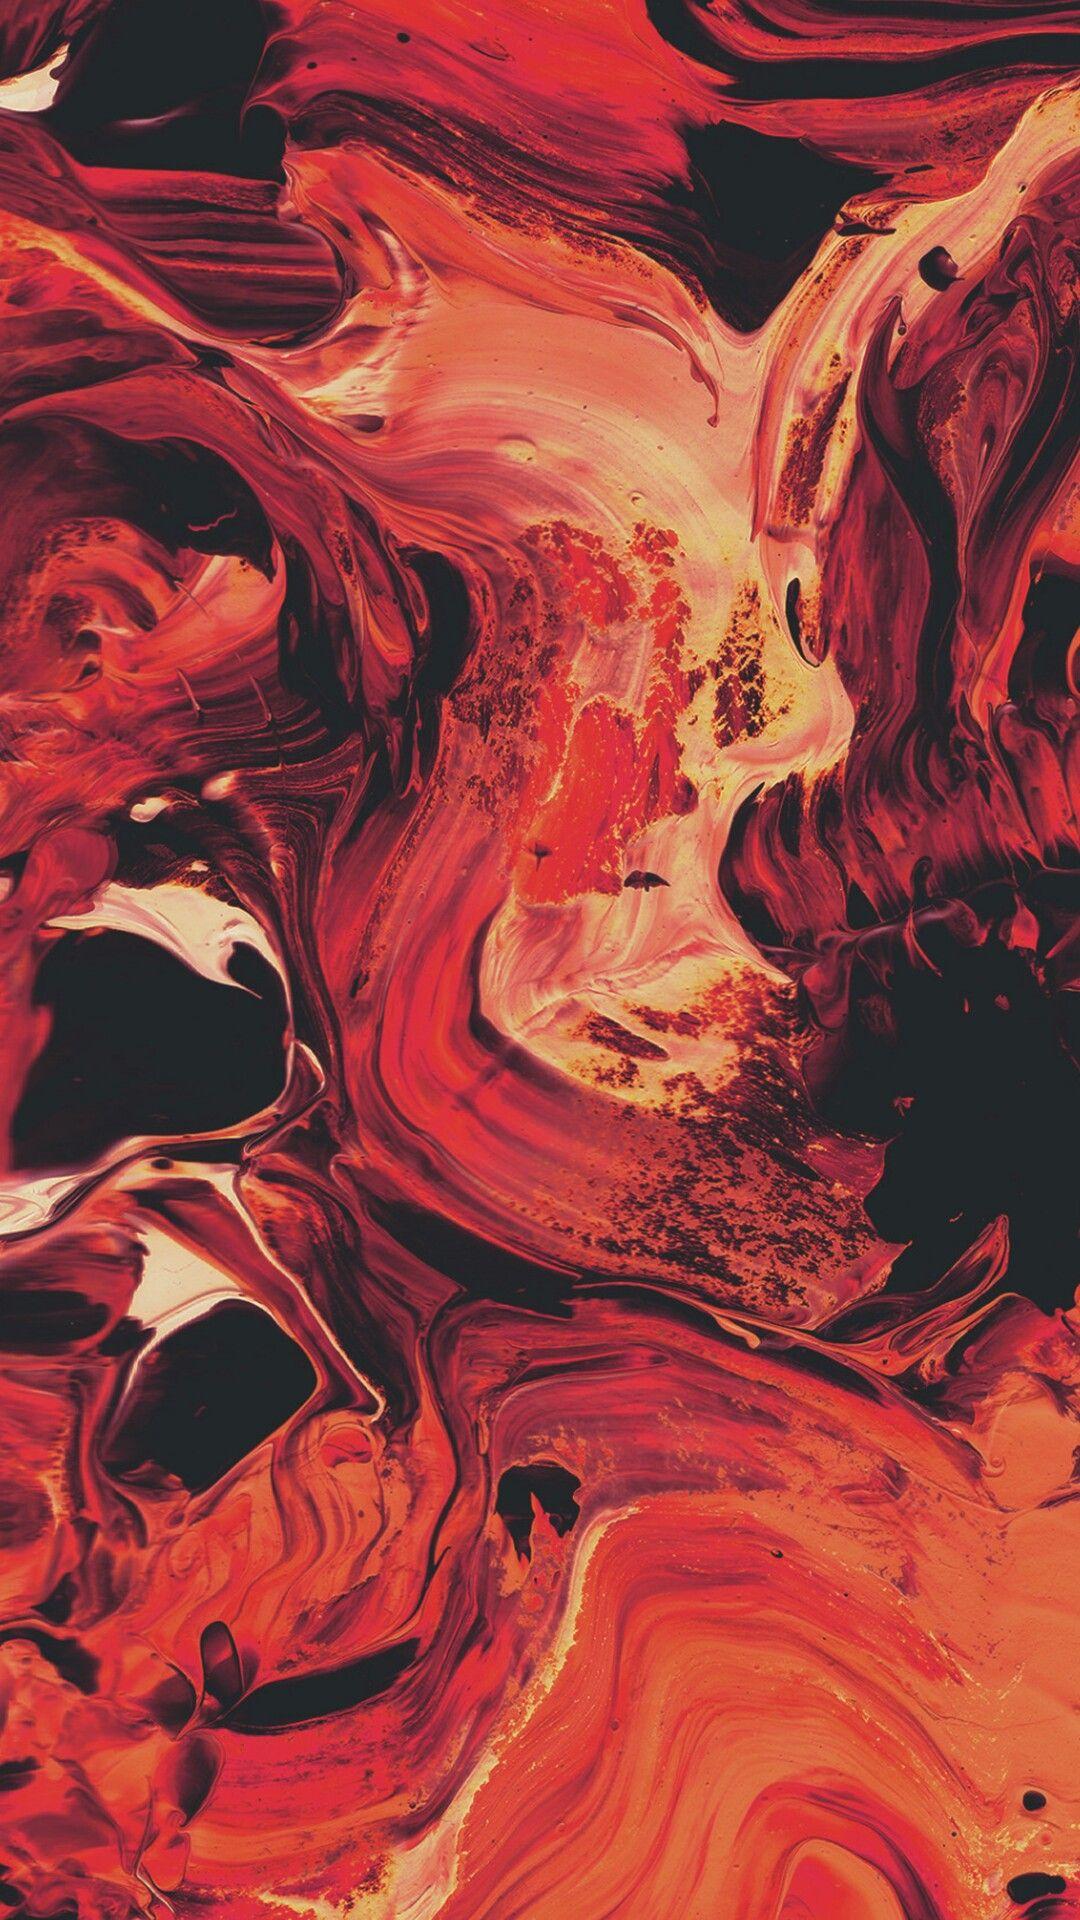 Pin Iyan Sofyan Abstract Amoled Liquid Gradient In 2019 Hintergrundbilder